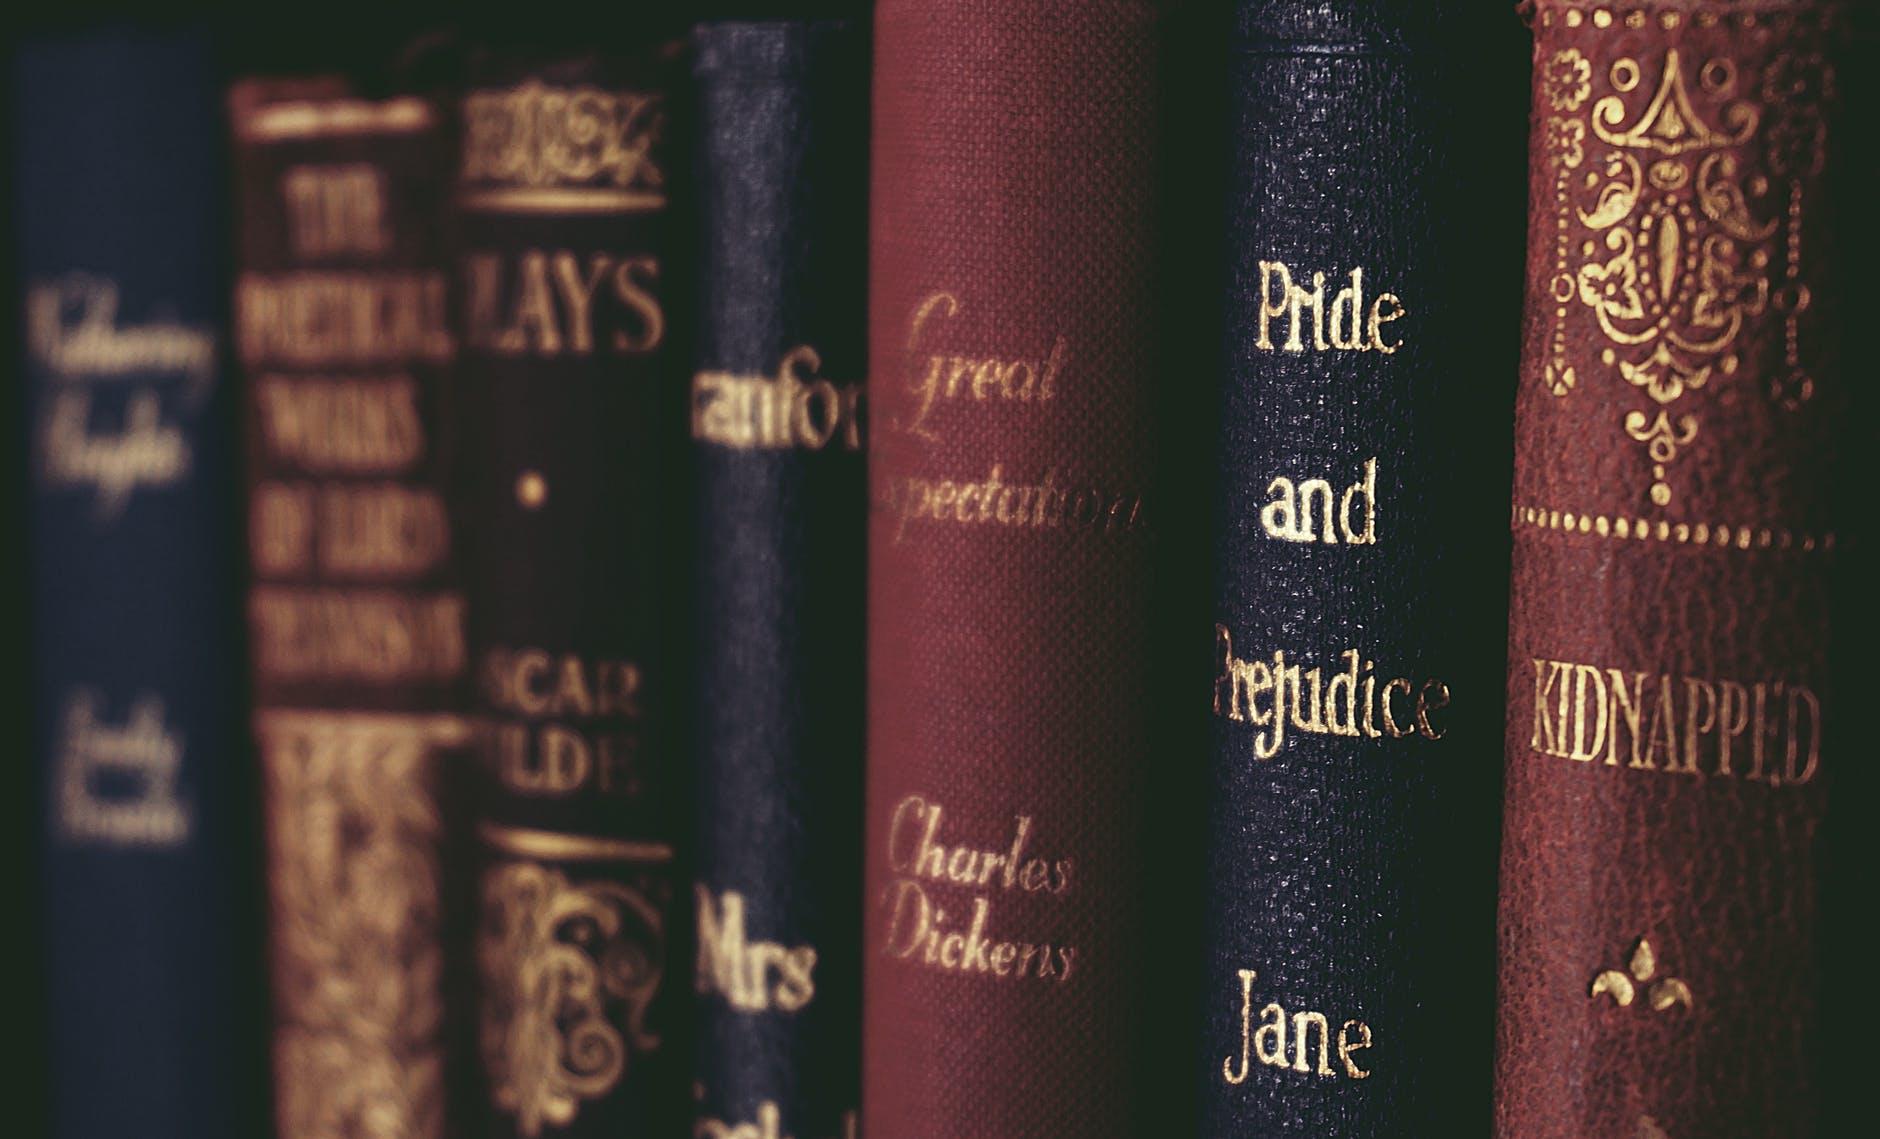 close up of books on shelf